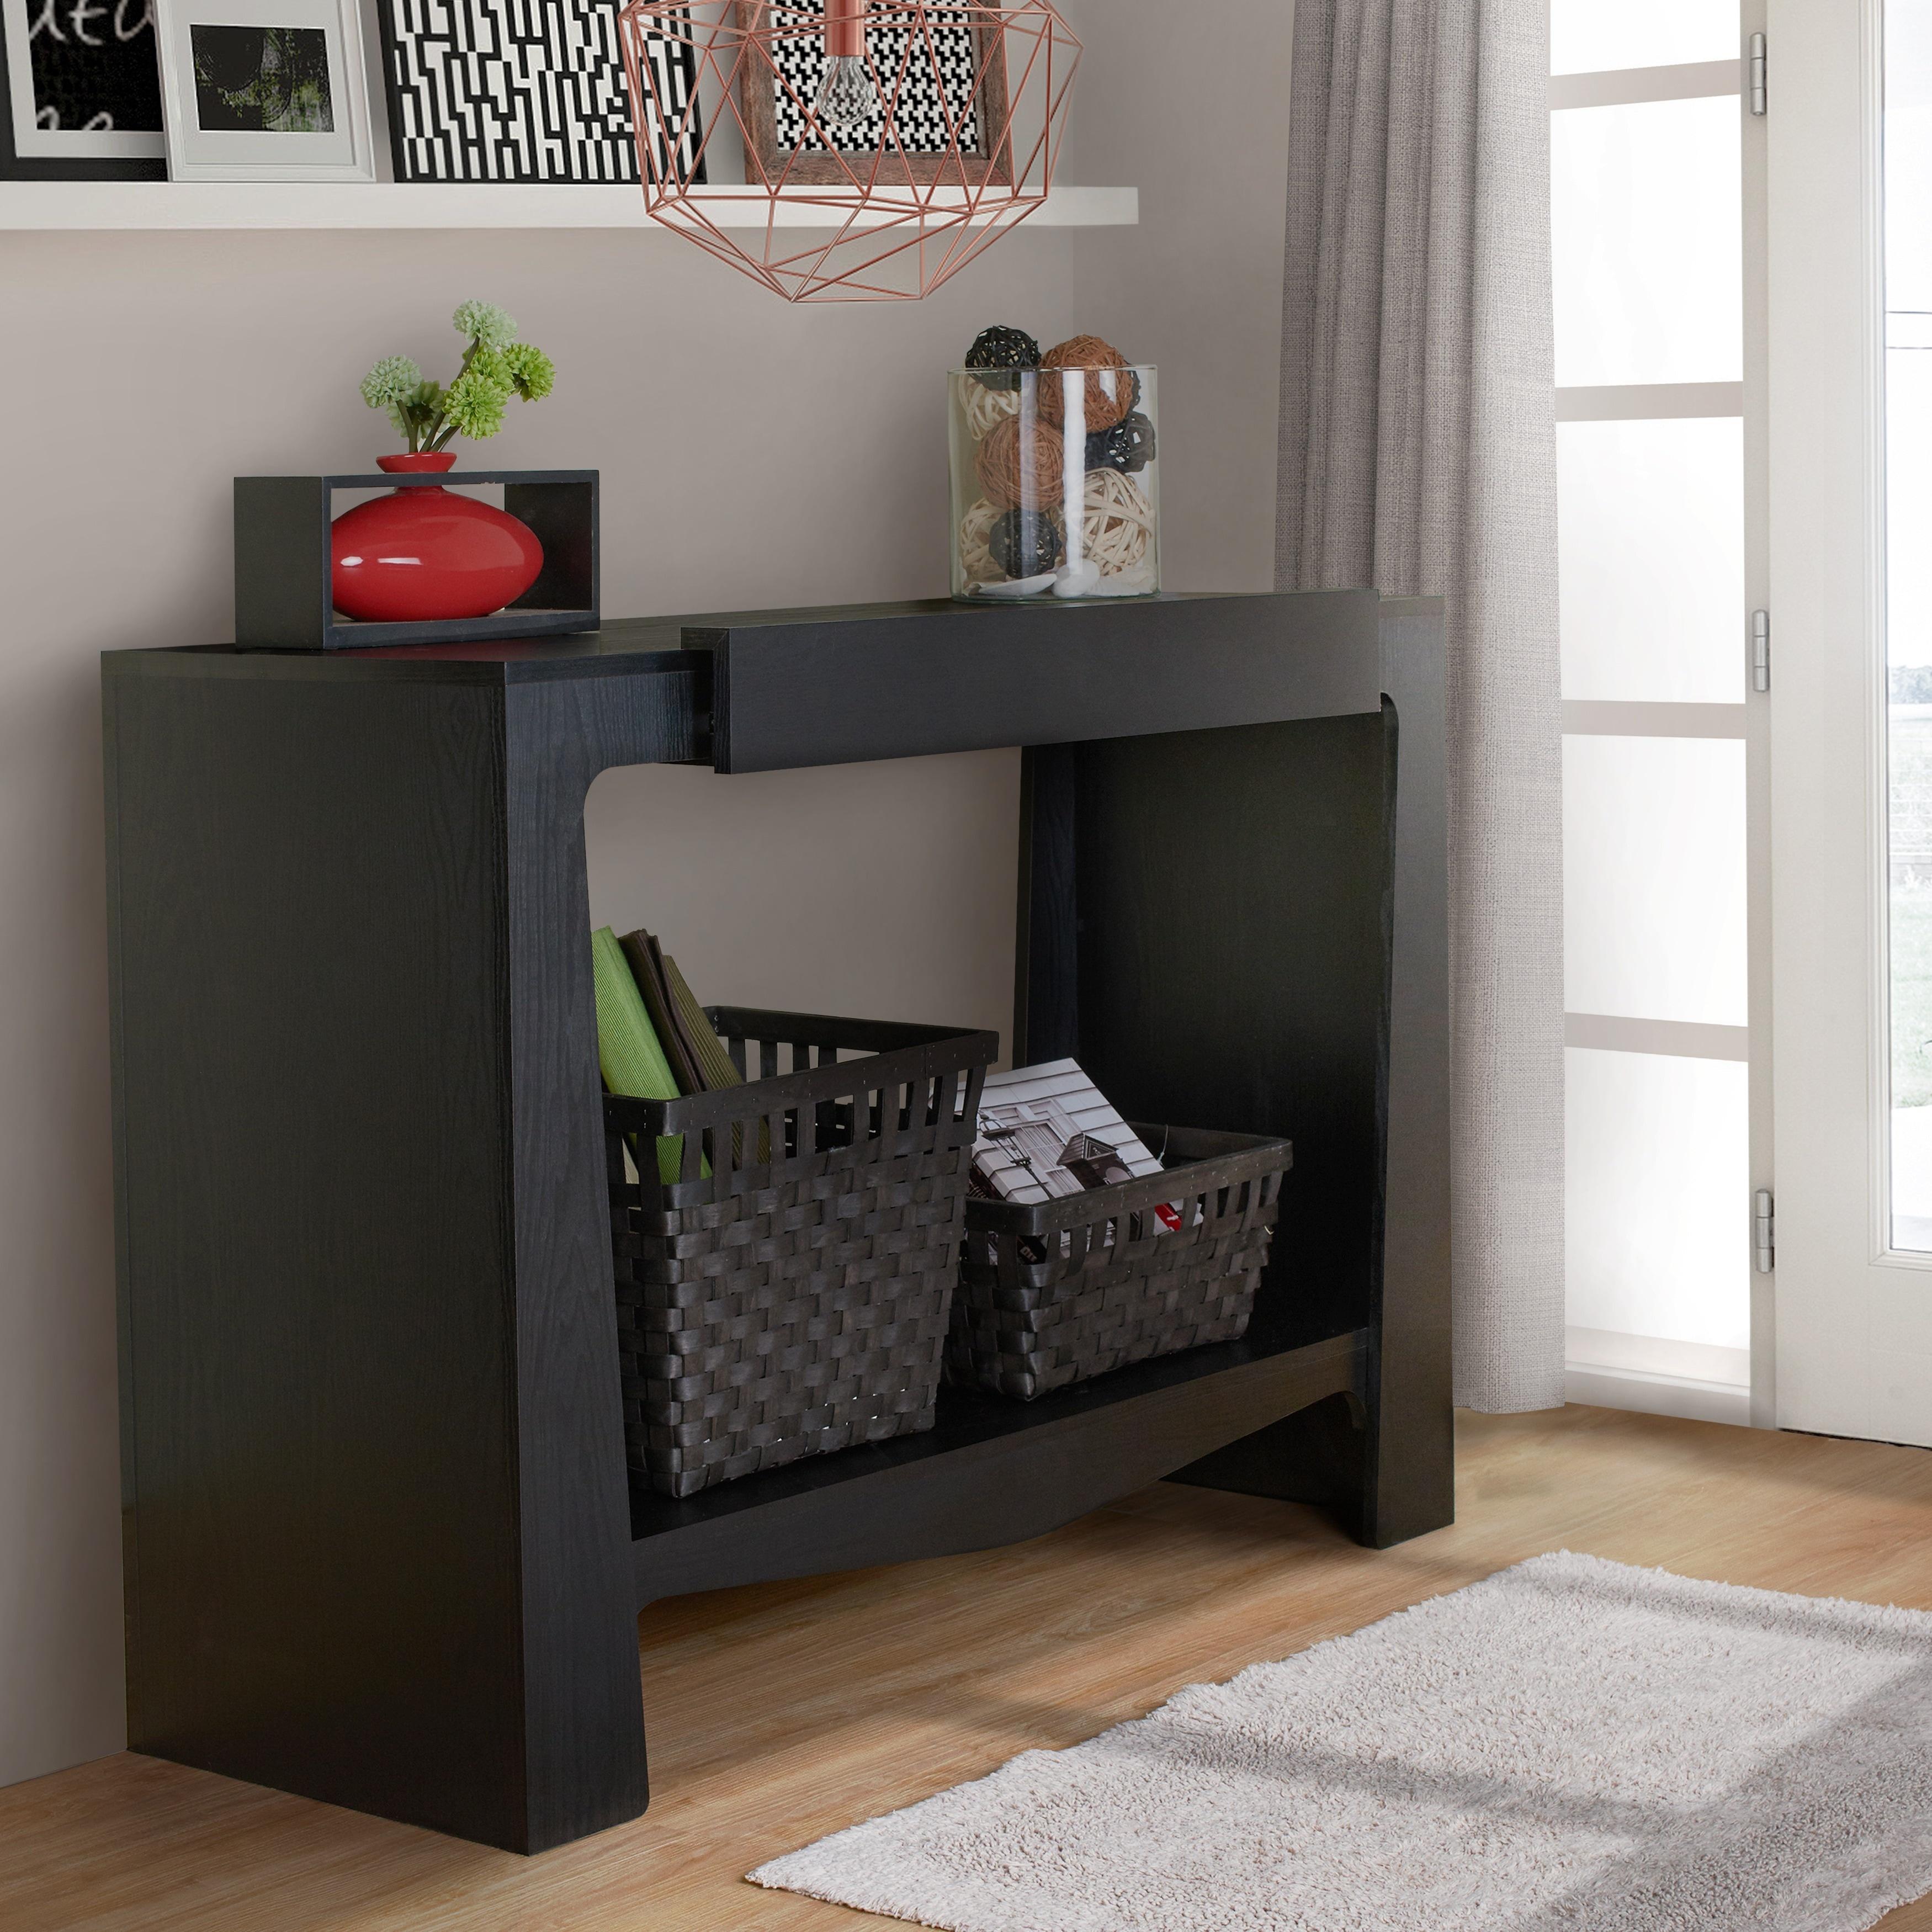 Shop Furniture of America Urbana Modern Hall